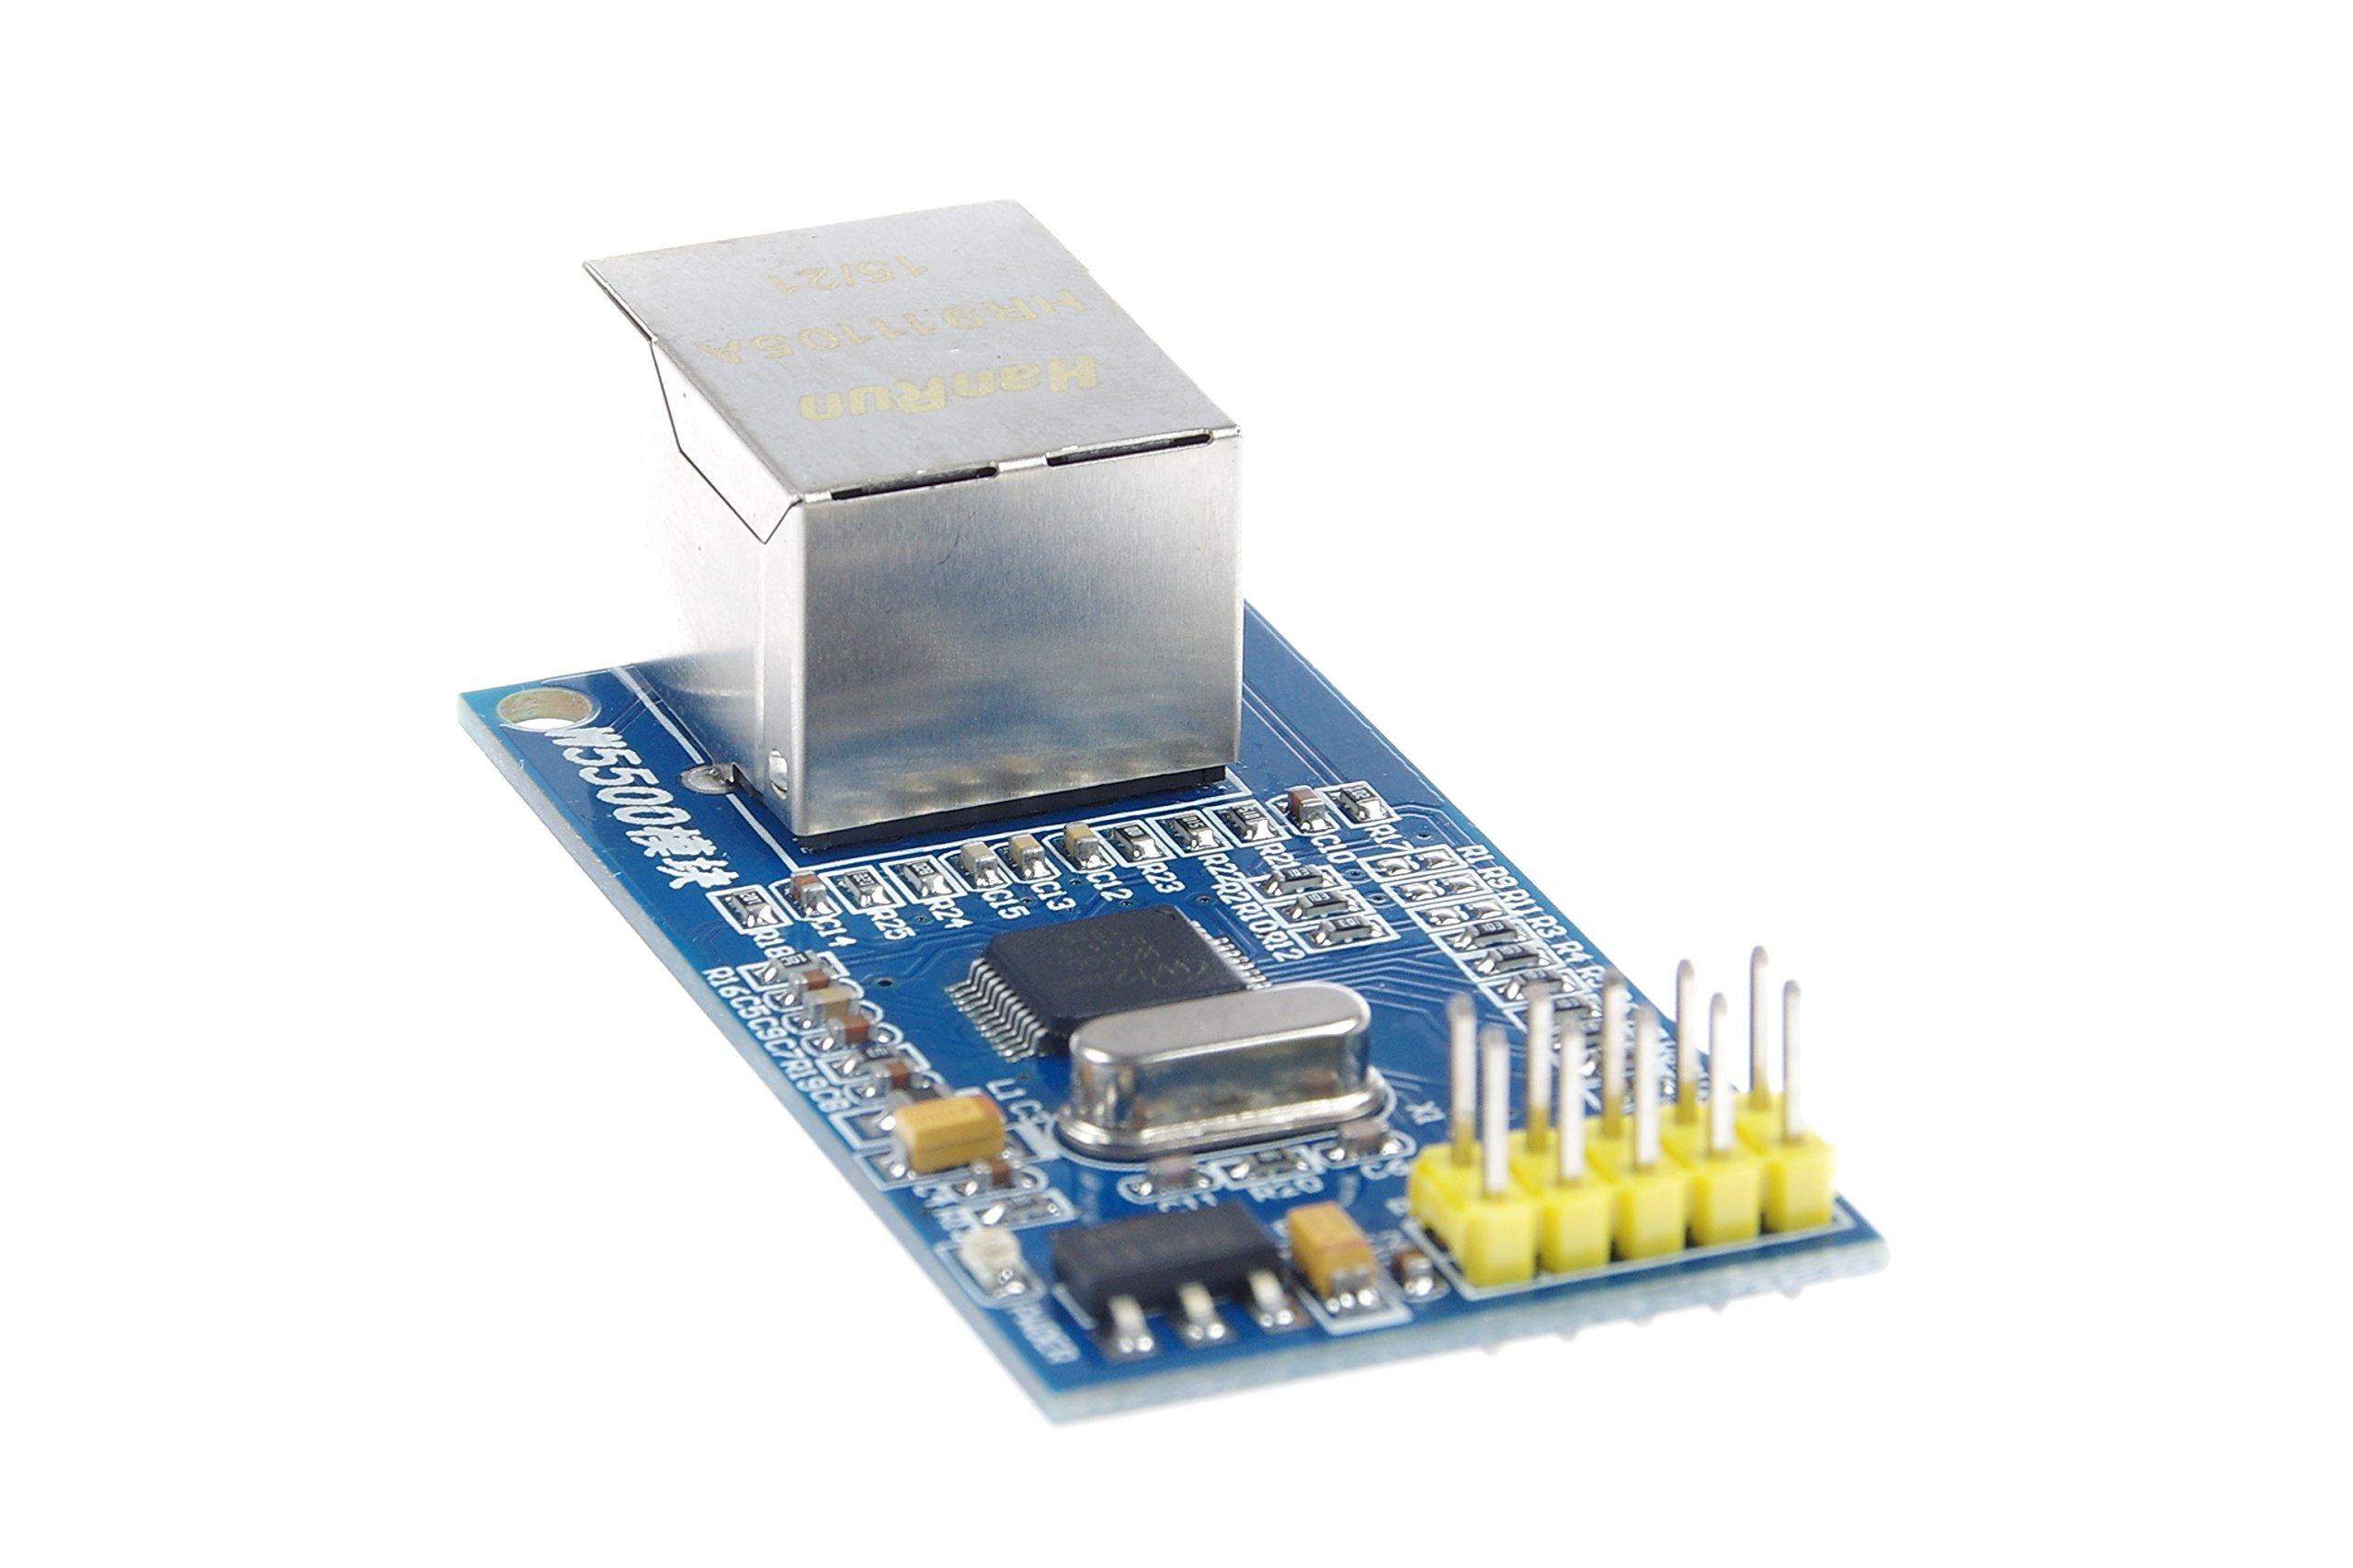 KNACRO W5500 Ethernet Network Module Hardware TCP/IP 51/STM32 Microcontroller Program over W5100 by KNACRO (Image #6)